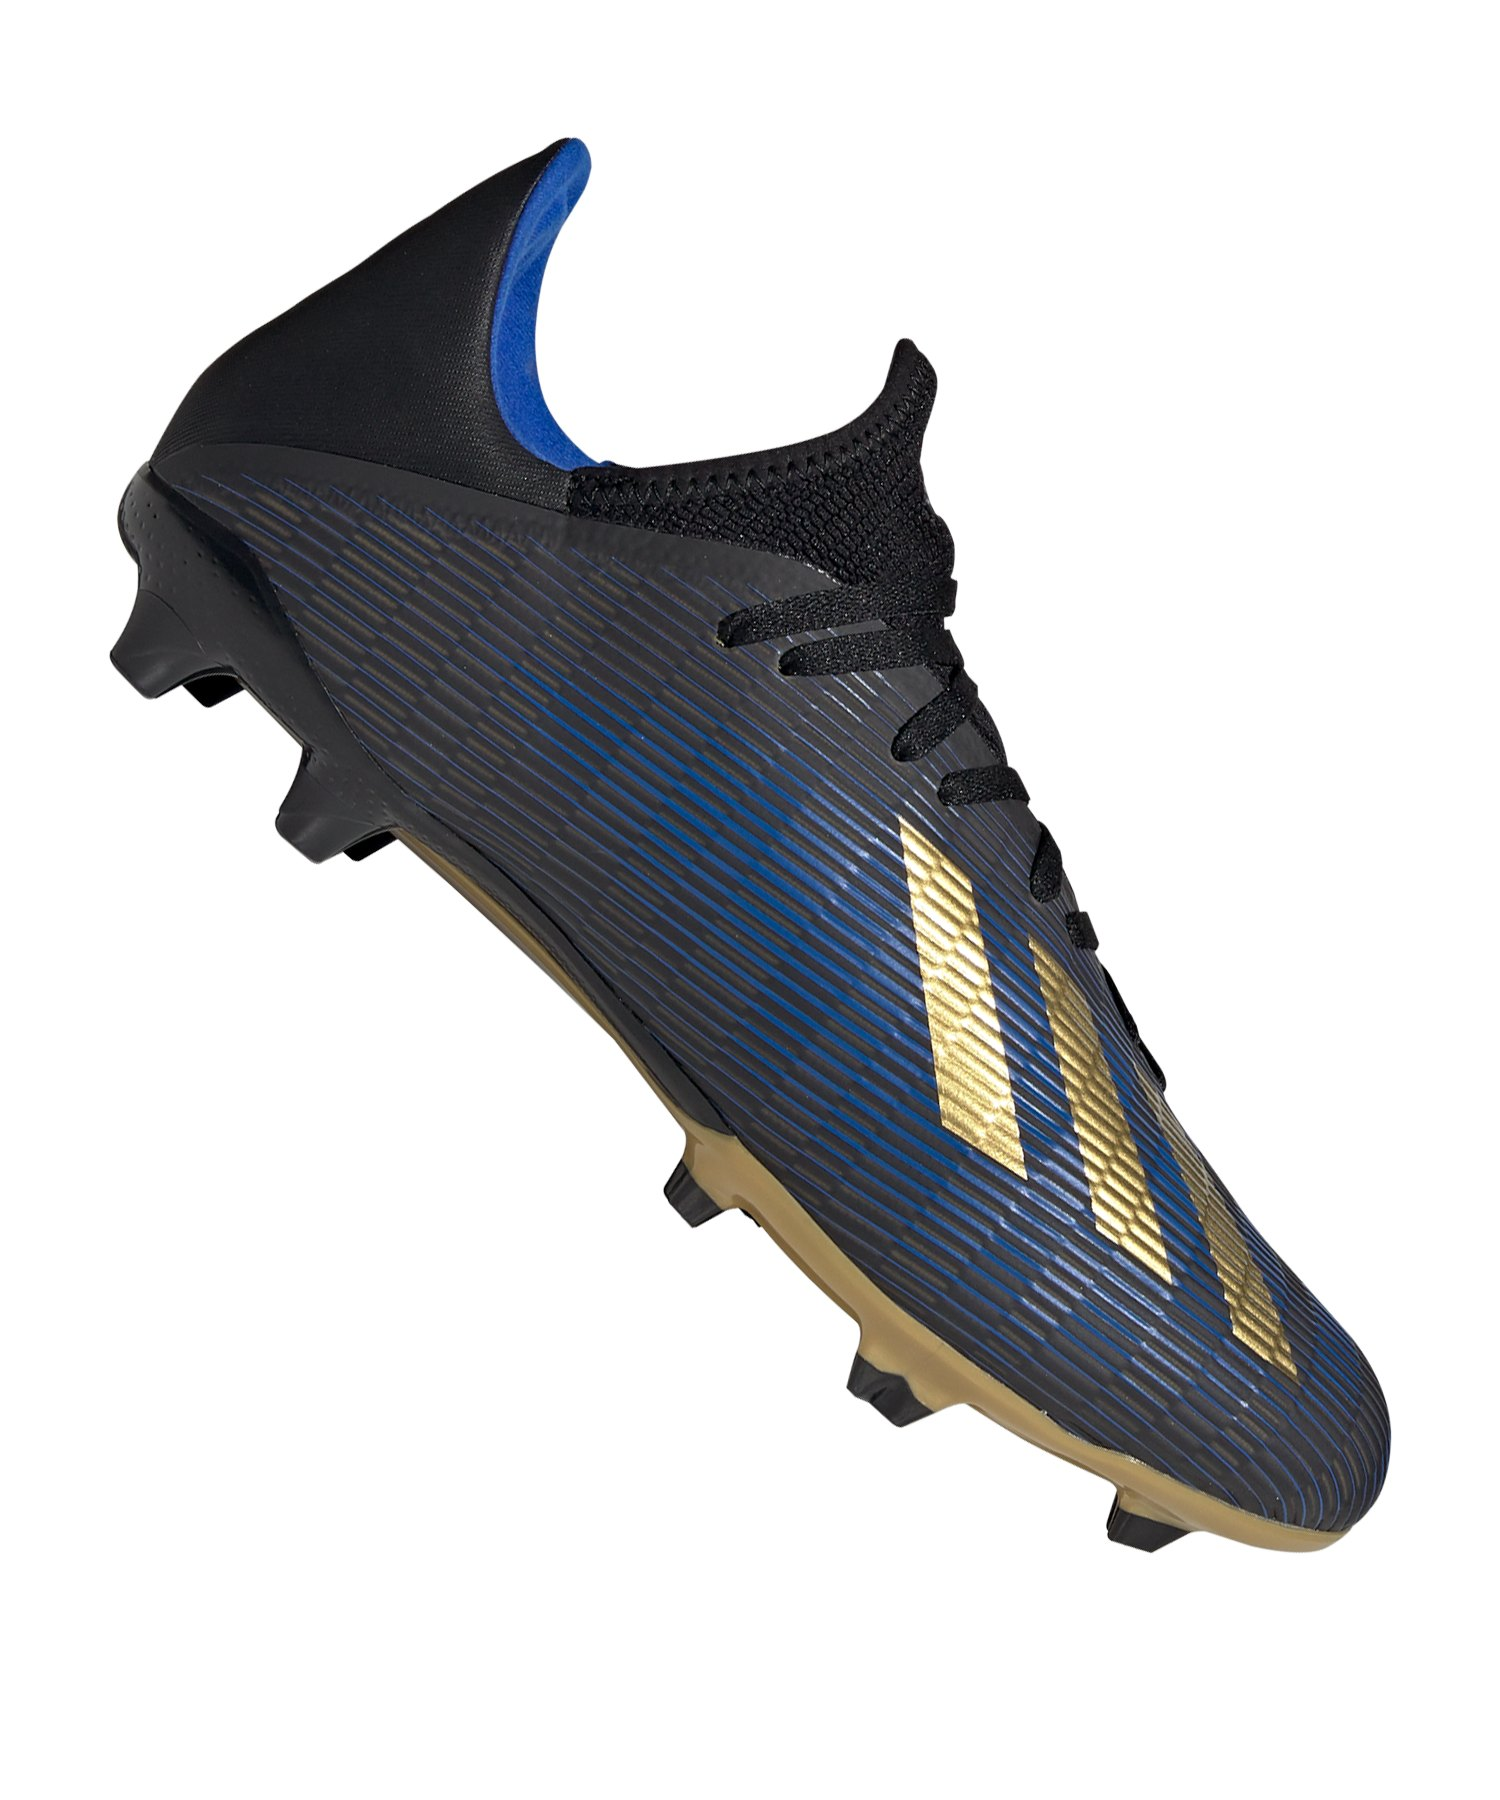 adidas X 19.3 FG Schwarz Blau Gold - schwarz